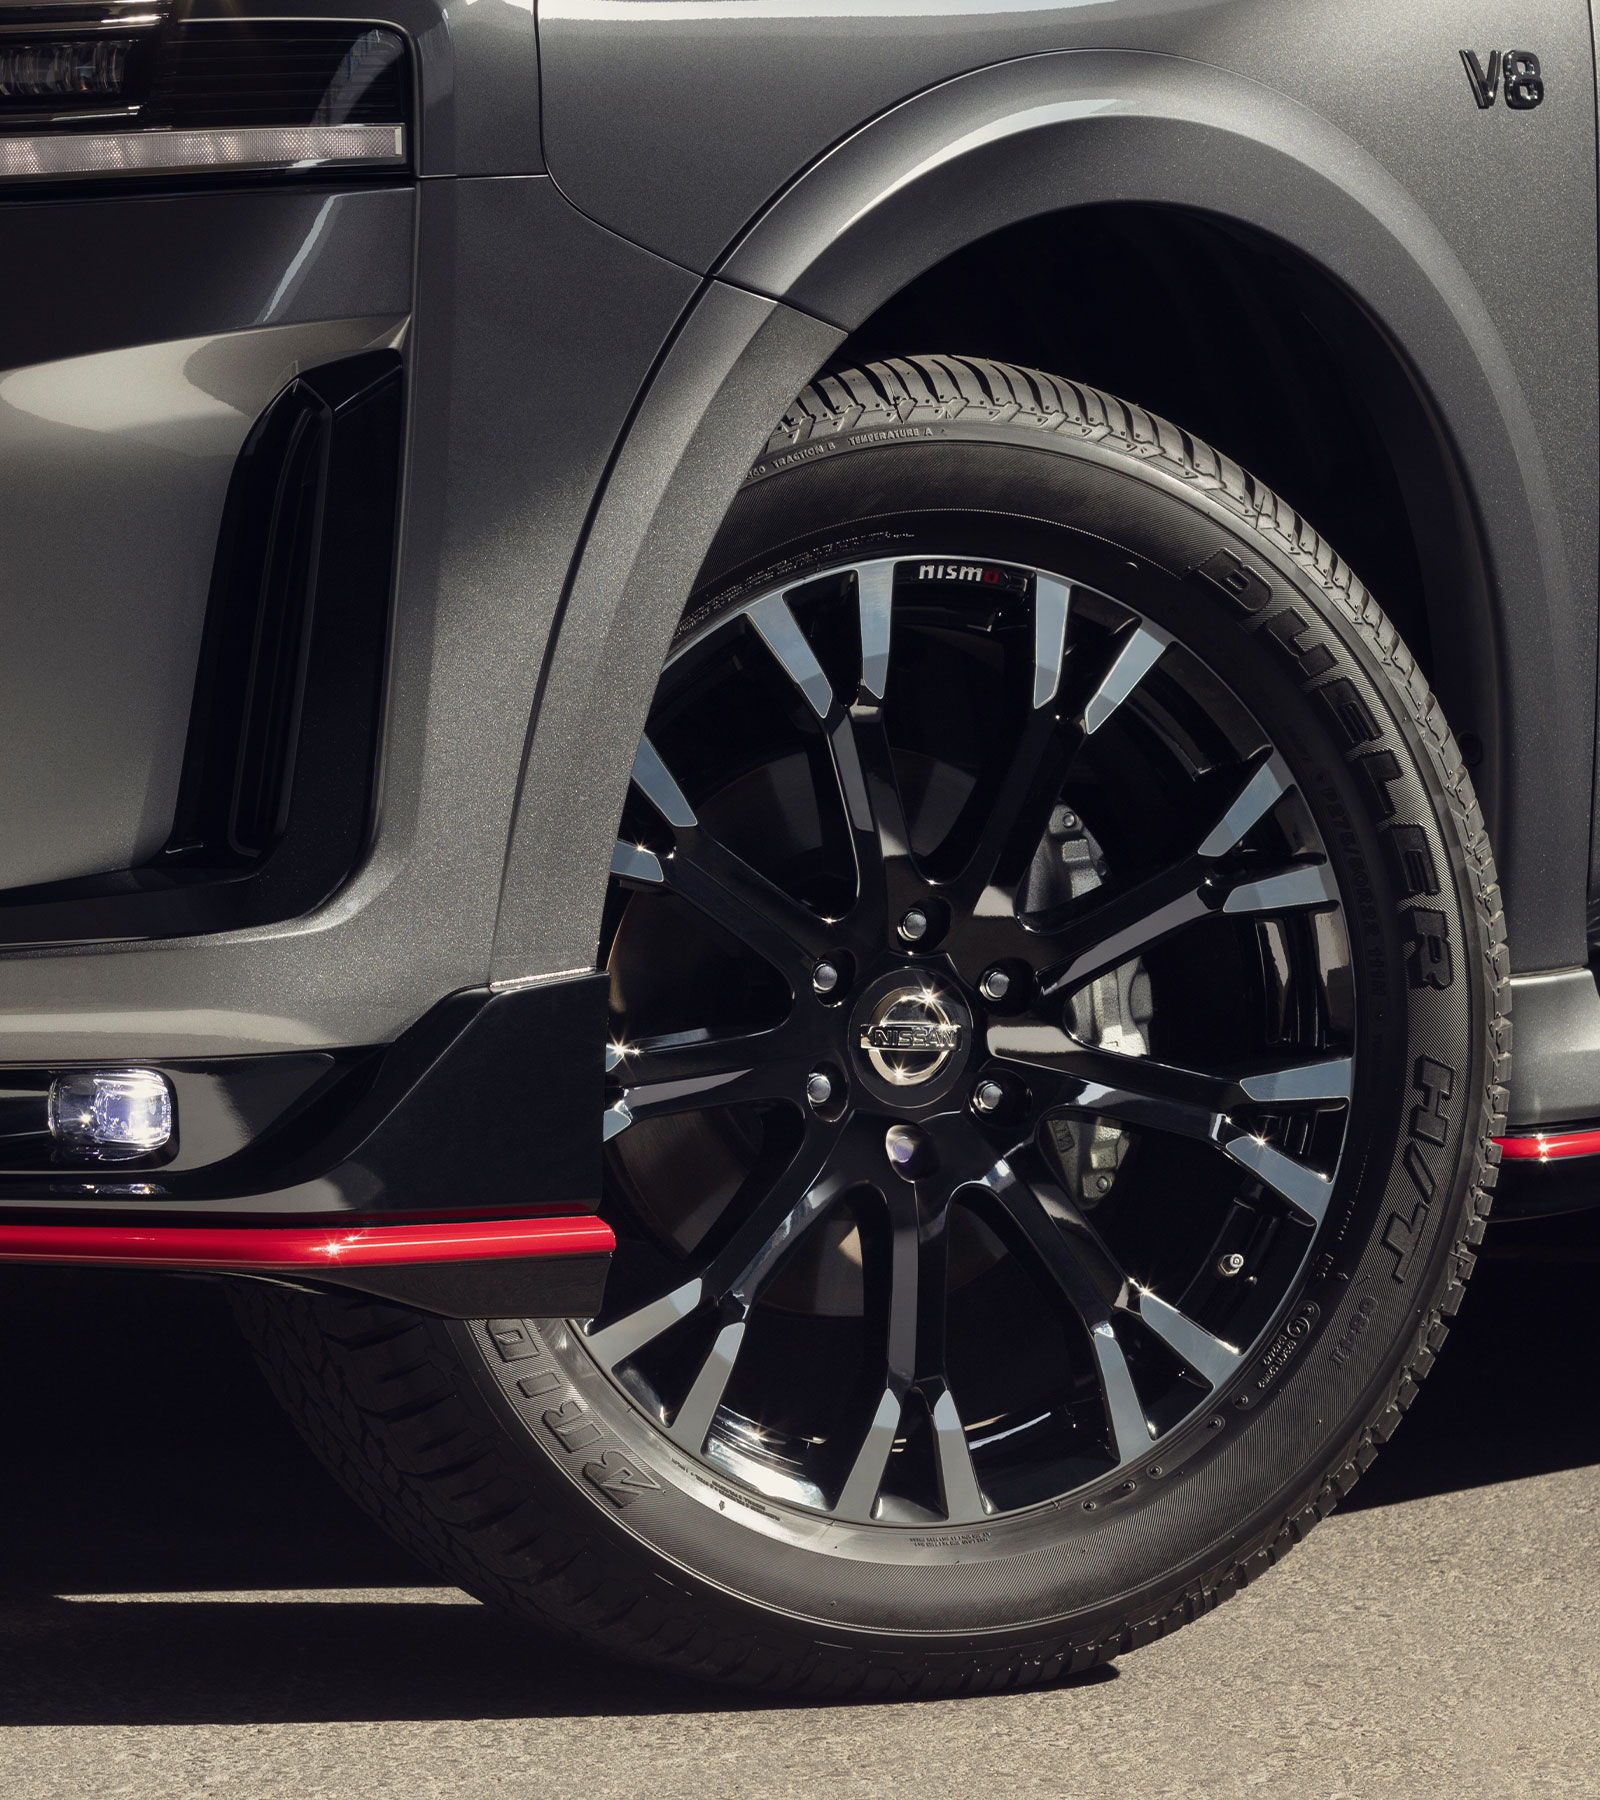 Nismo patrol wheels